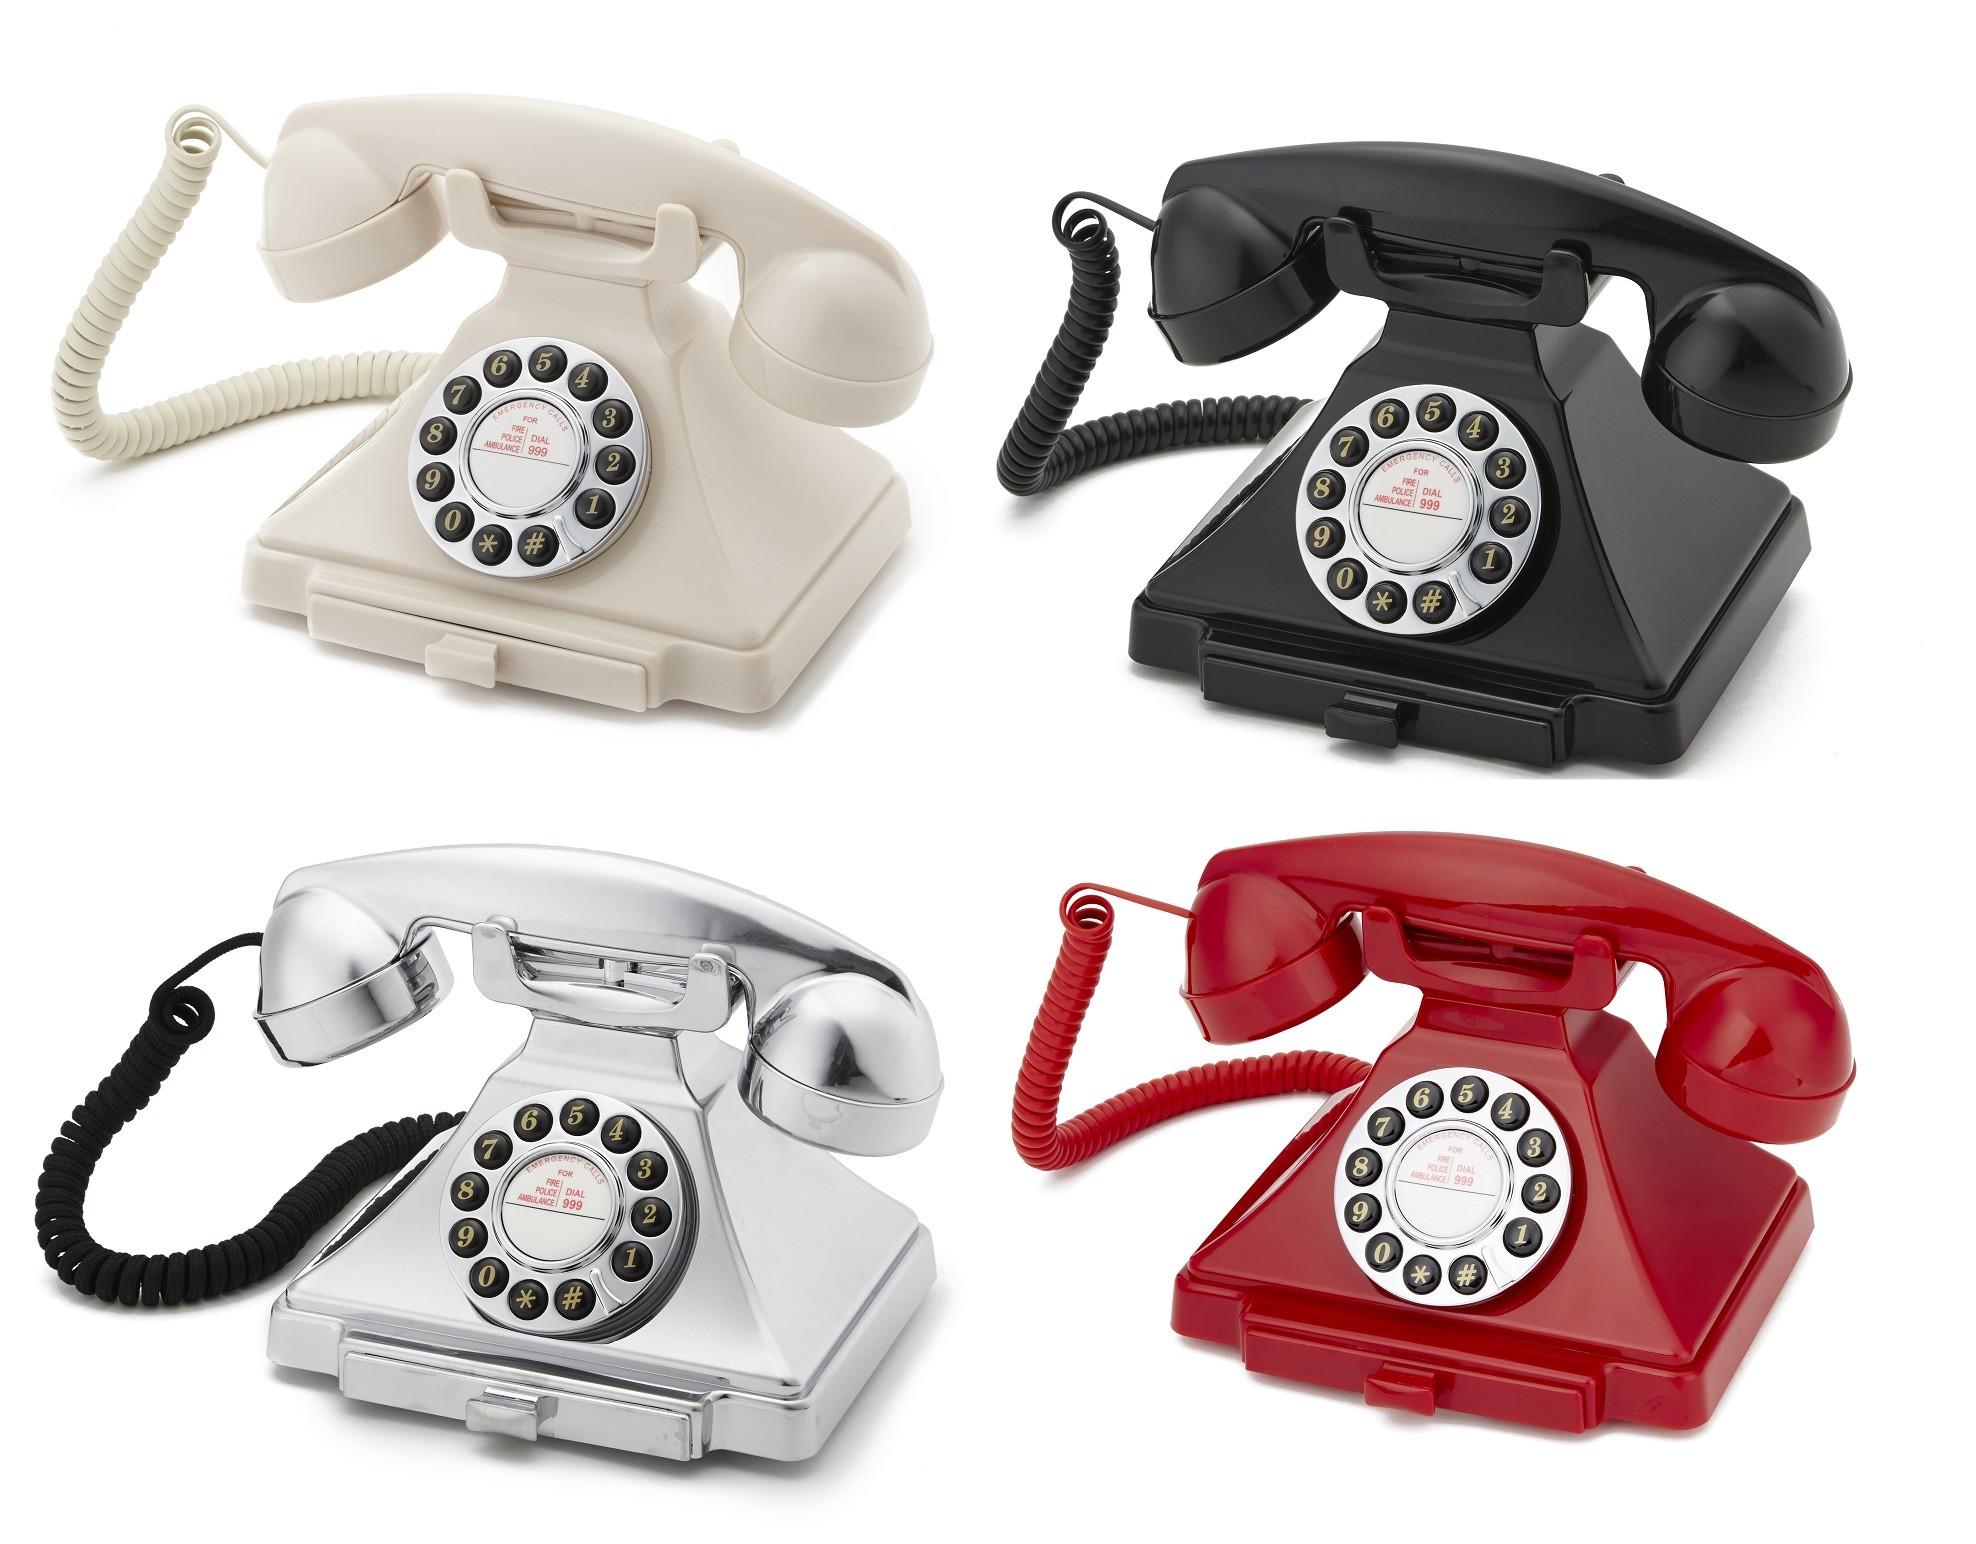 Classical GPO 1929S Carrington Push Button Telephone